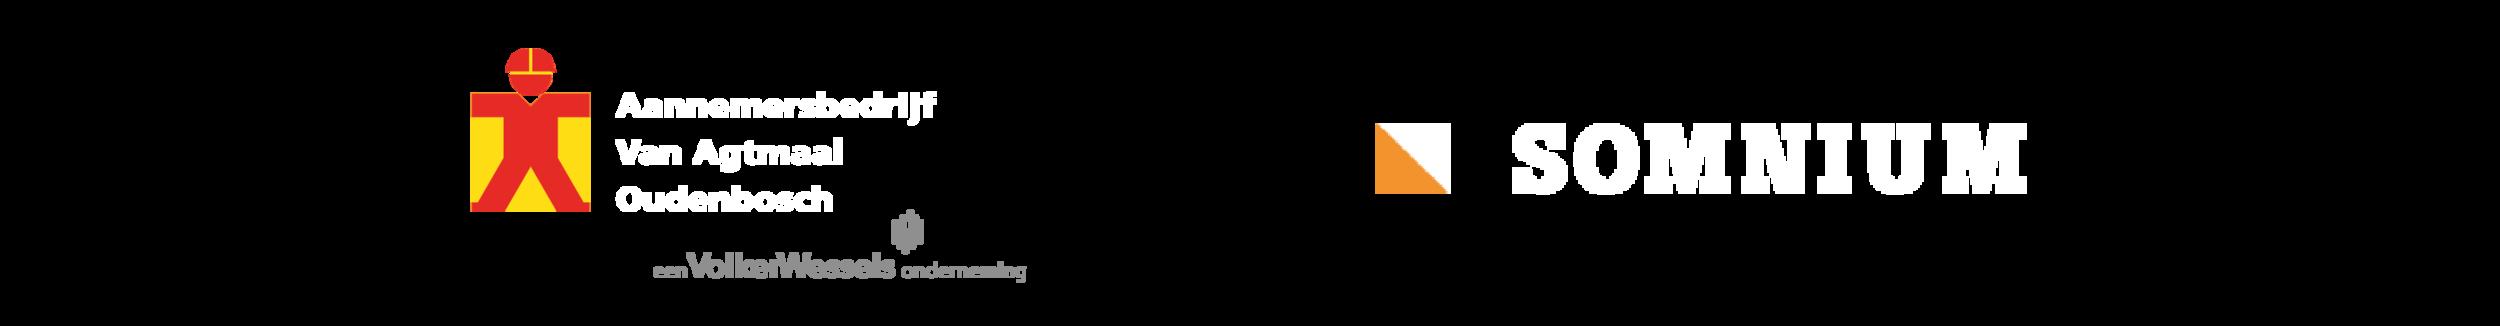 AGT1_VanAgtmaal_VW_Logo_FC-01.png